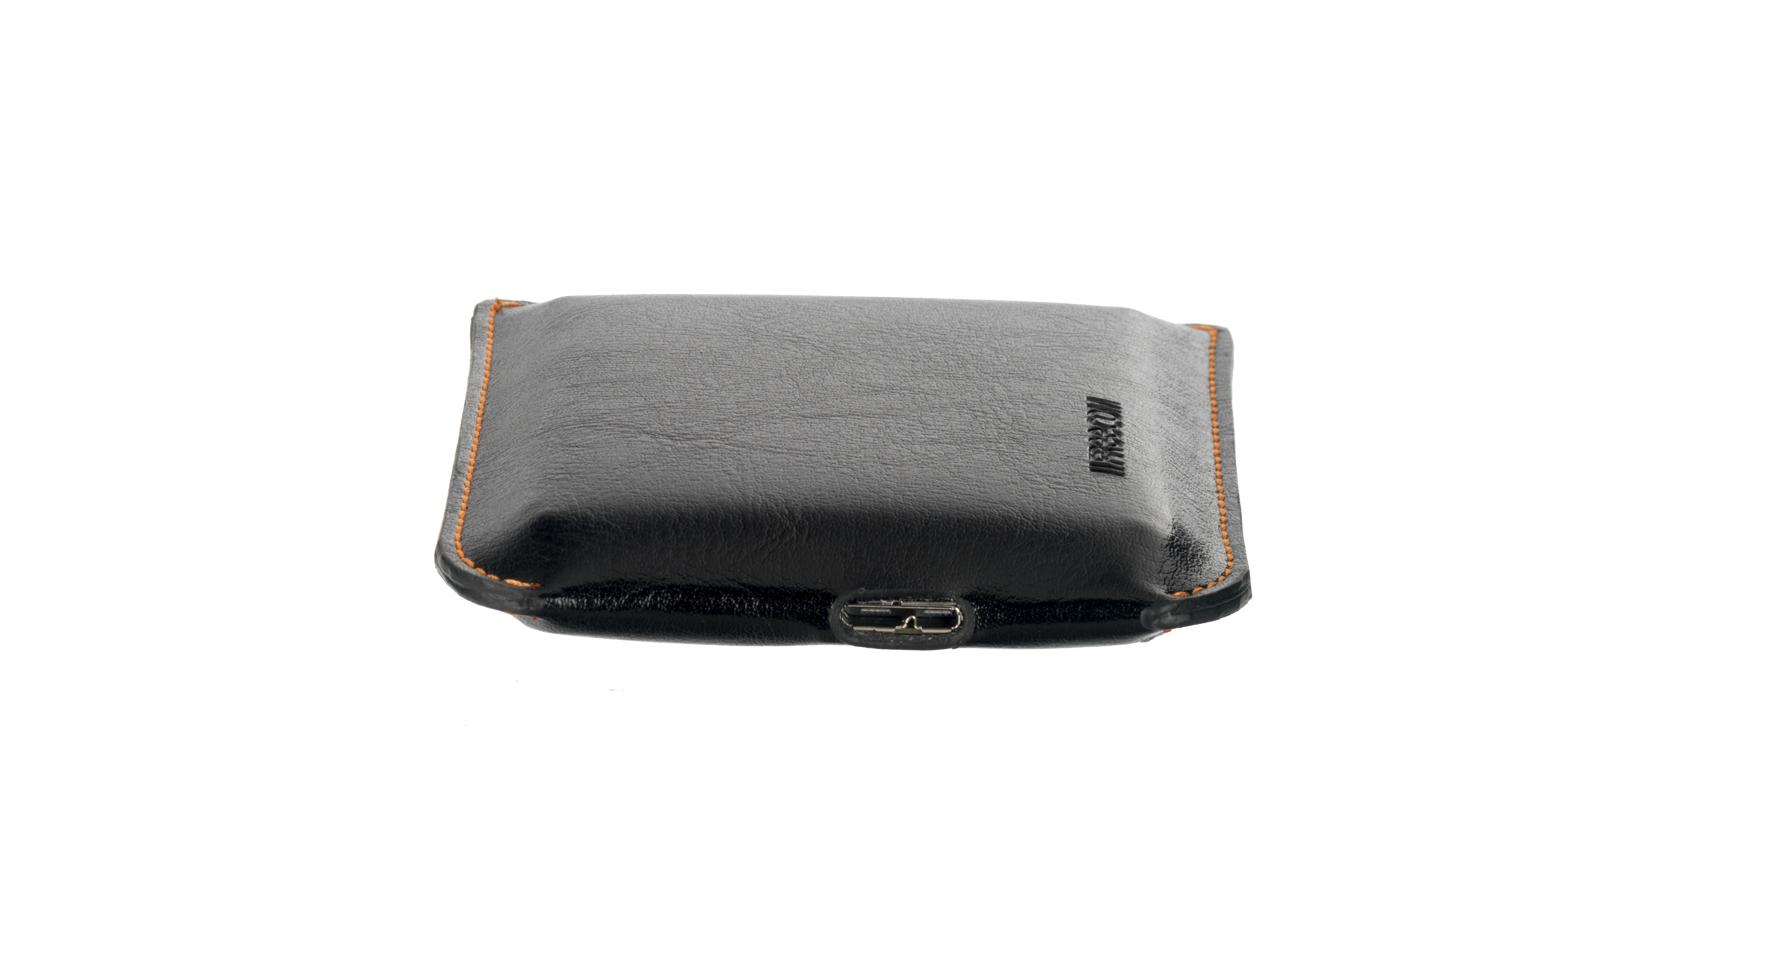 Freecom Mobile Drive XXS Leather 1TB